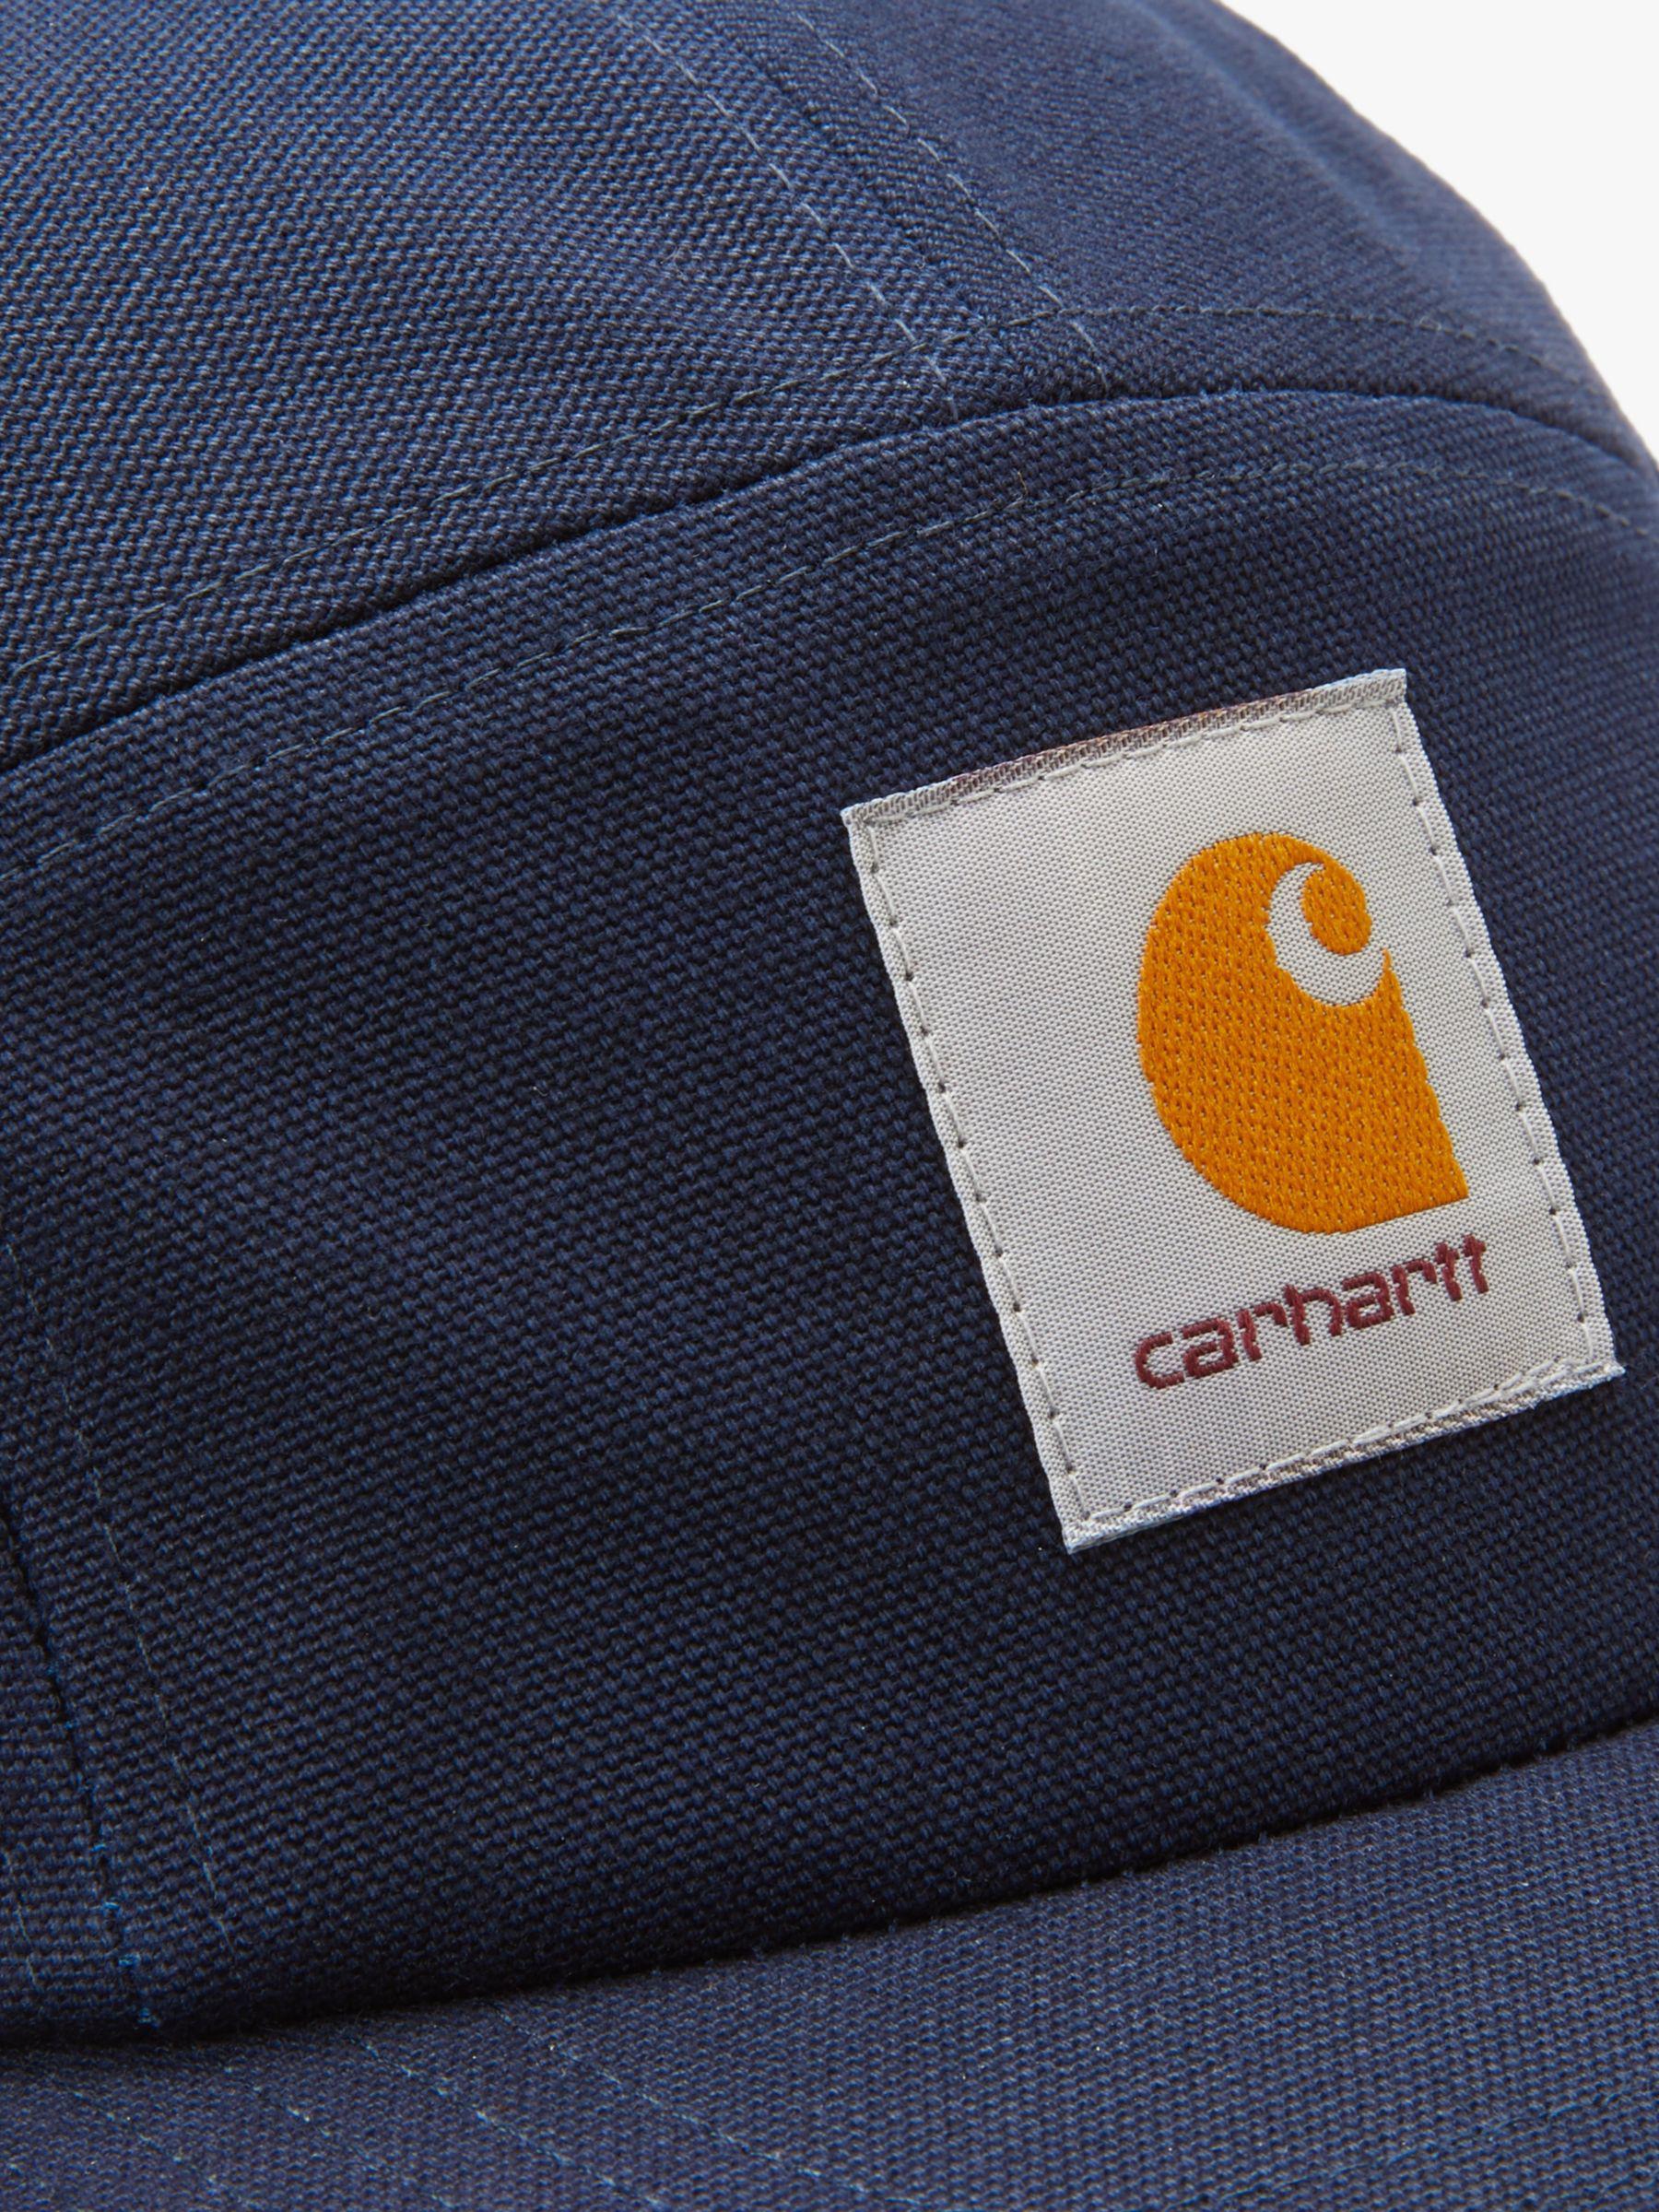 ab1c887c4c5d0 Carhartt WIP Backley Cap Dark Navy in Blue for Men - Save 54% - Lyst